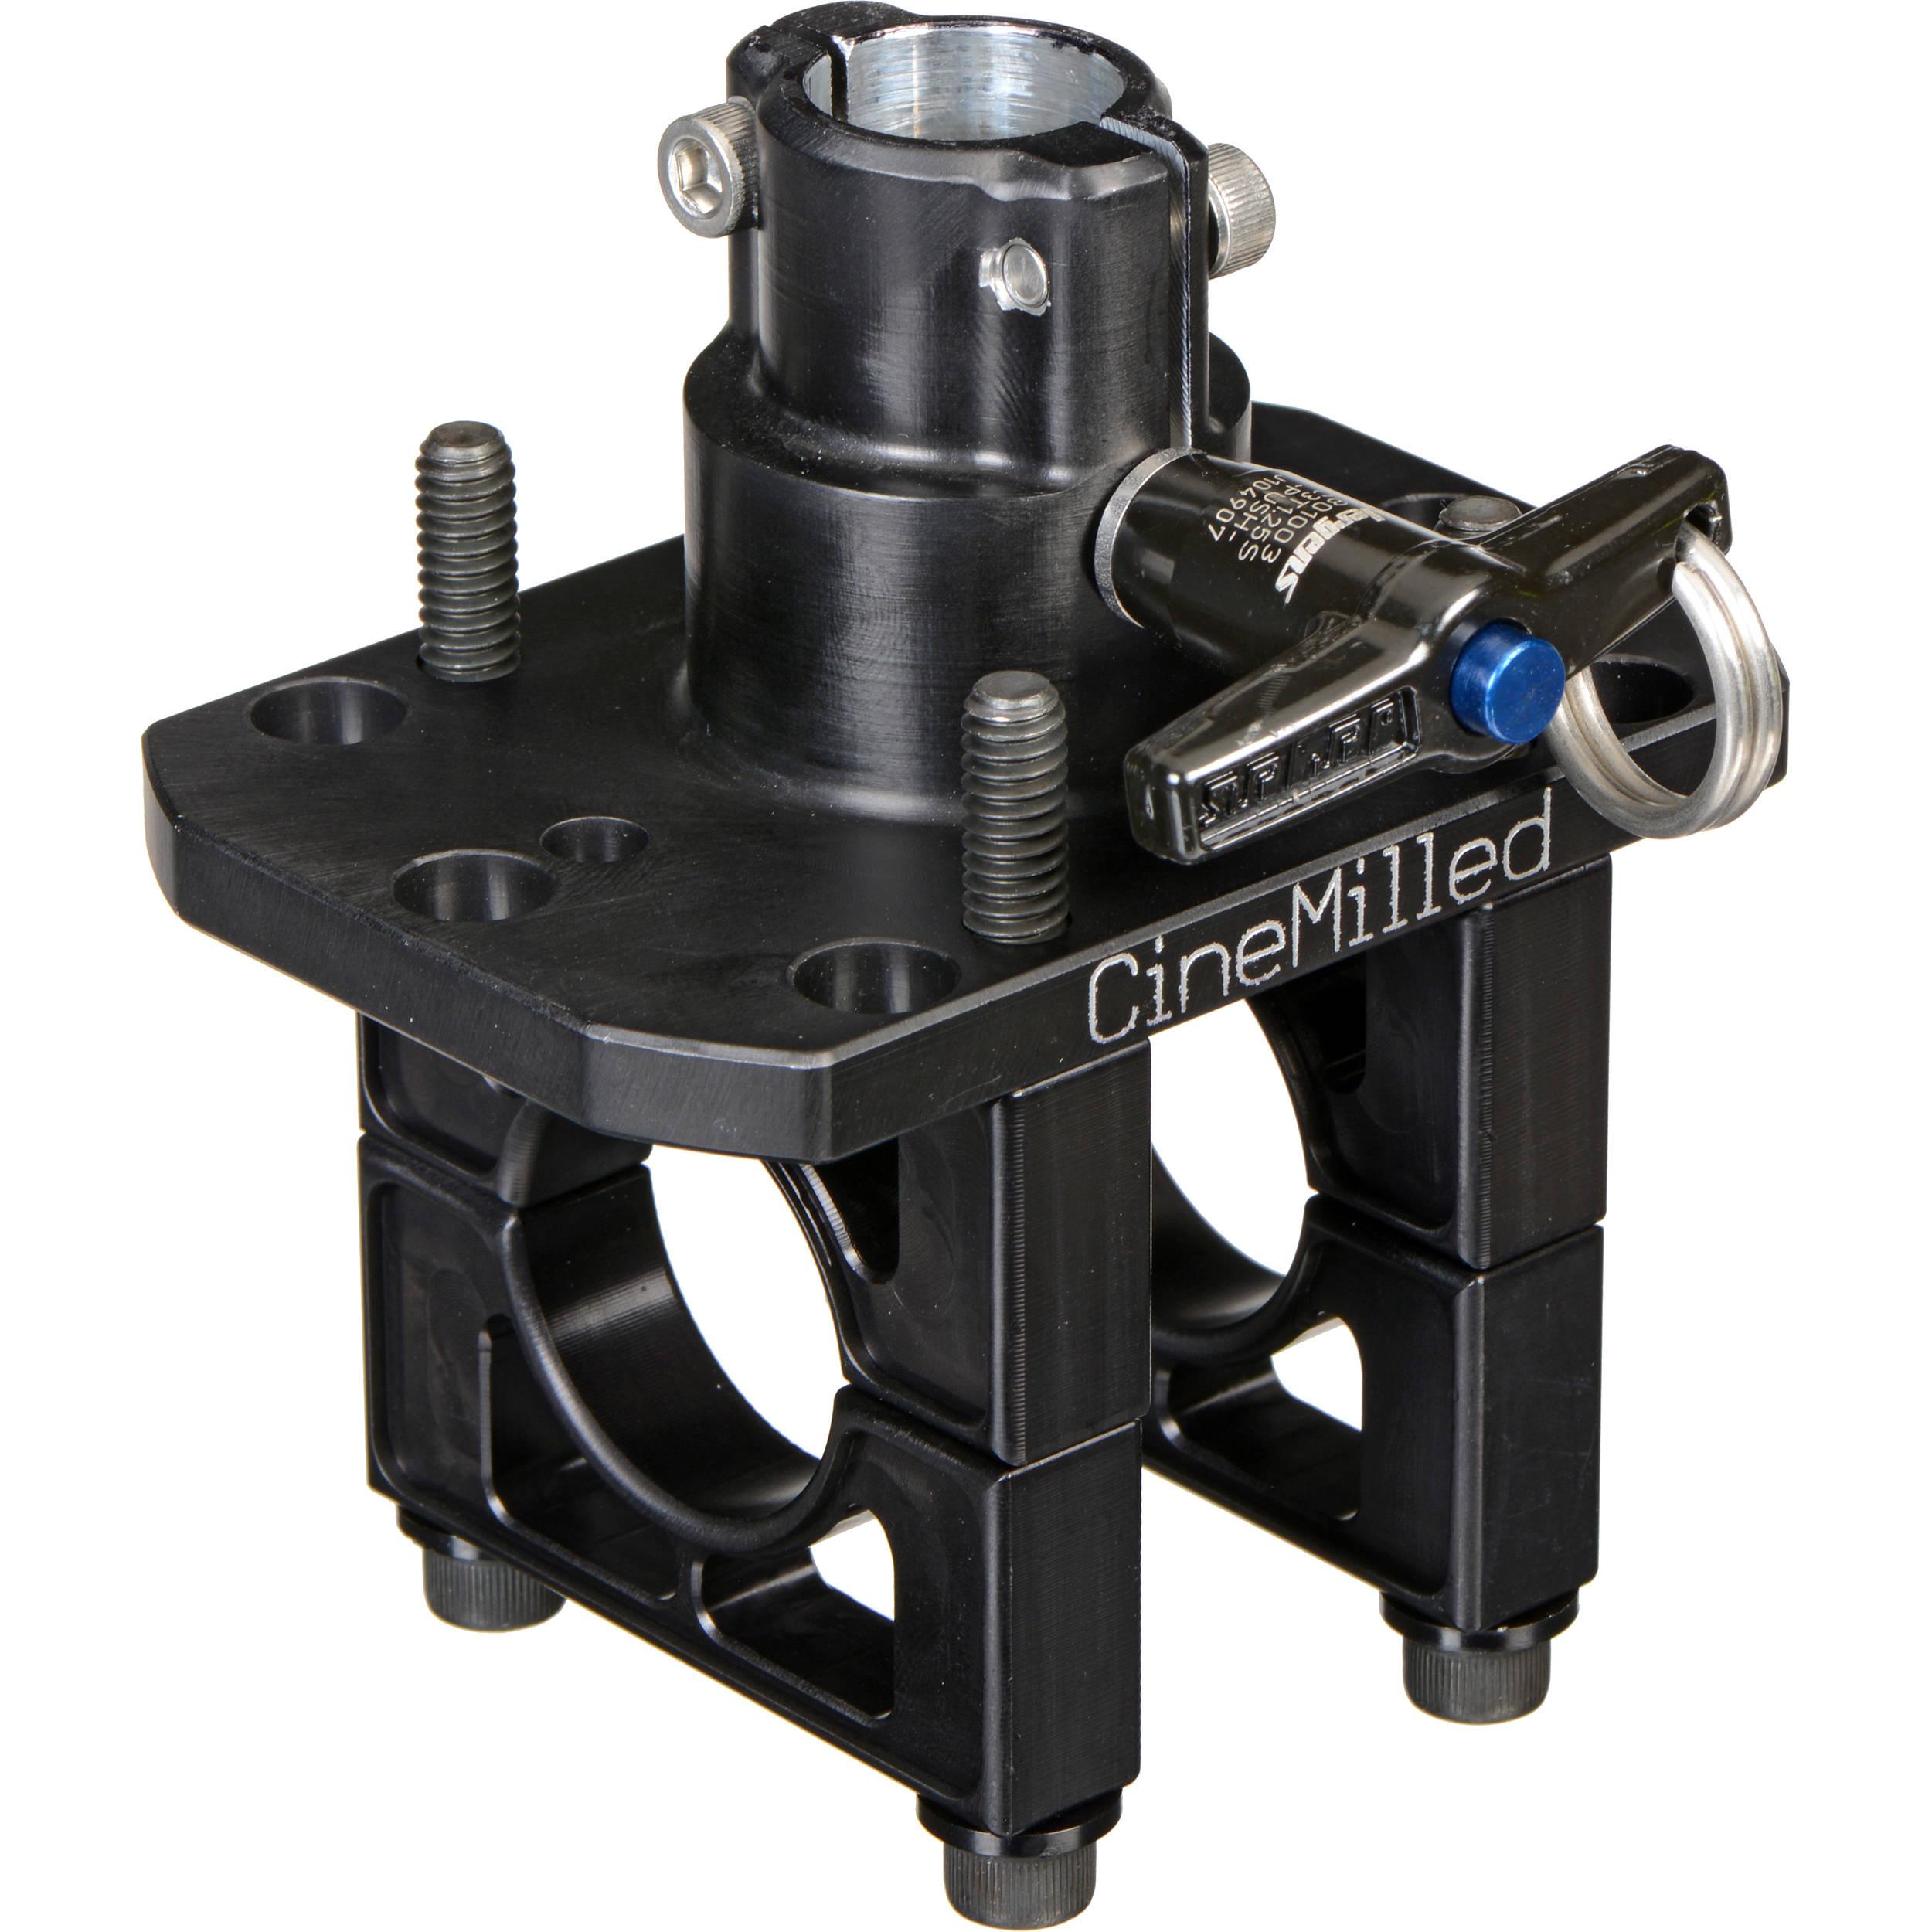 CineMilled DJI Ronin Stabilizer Armpost Adaptor (19mm)